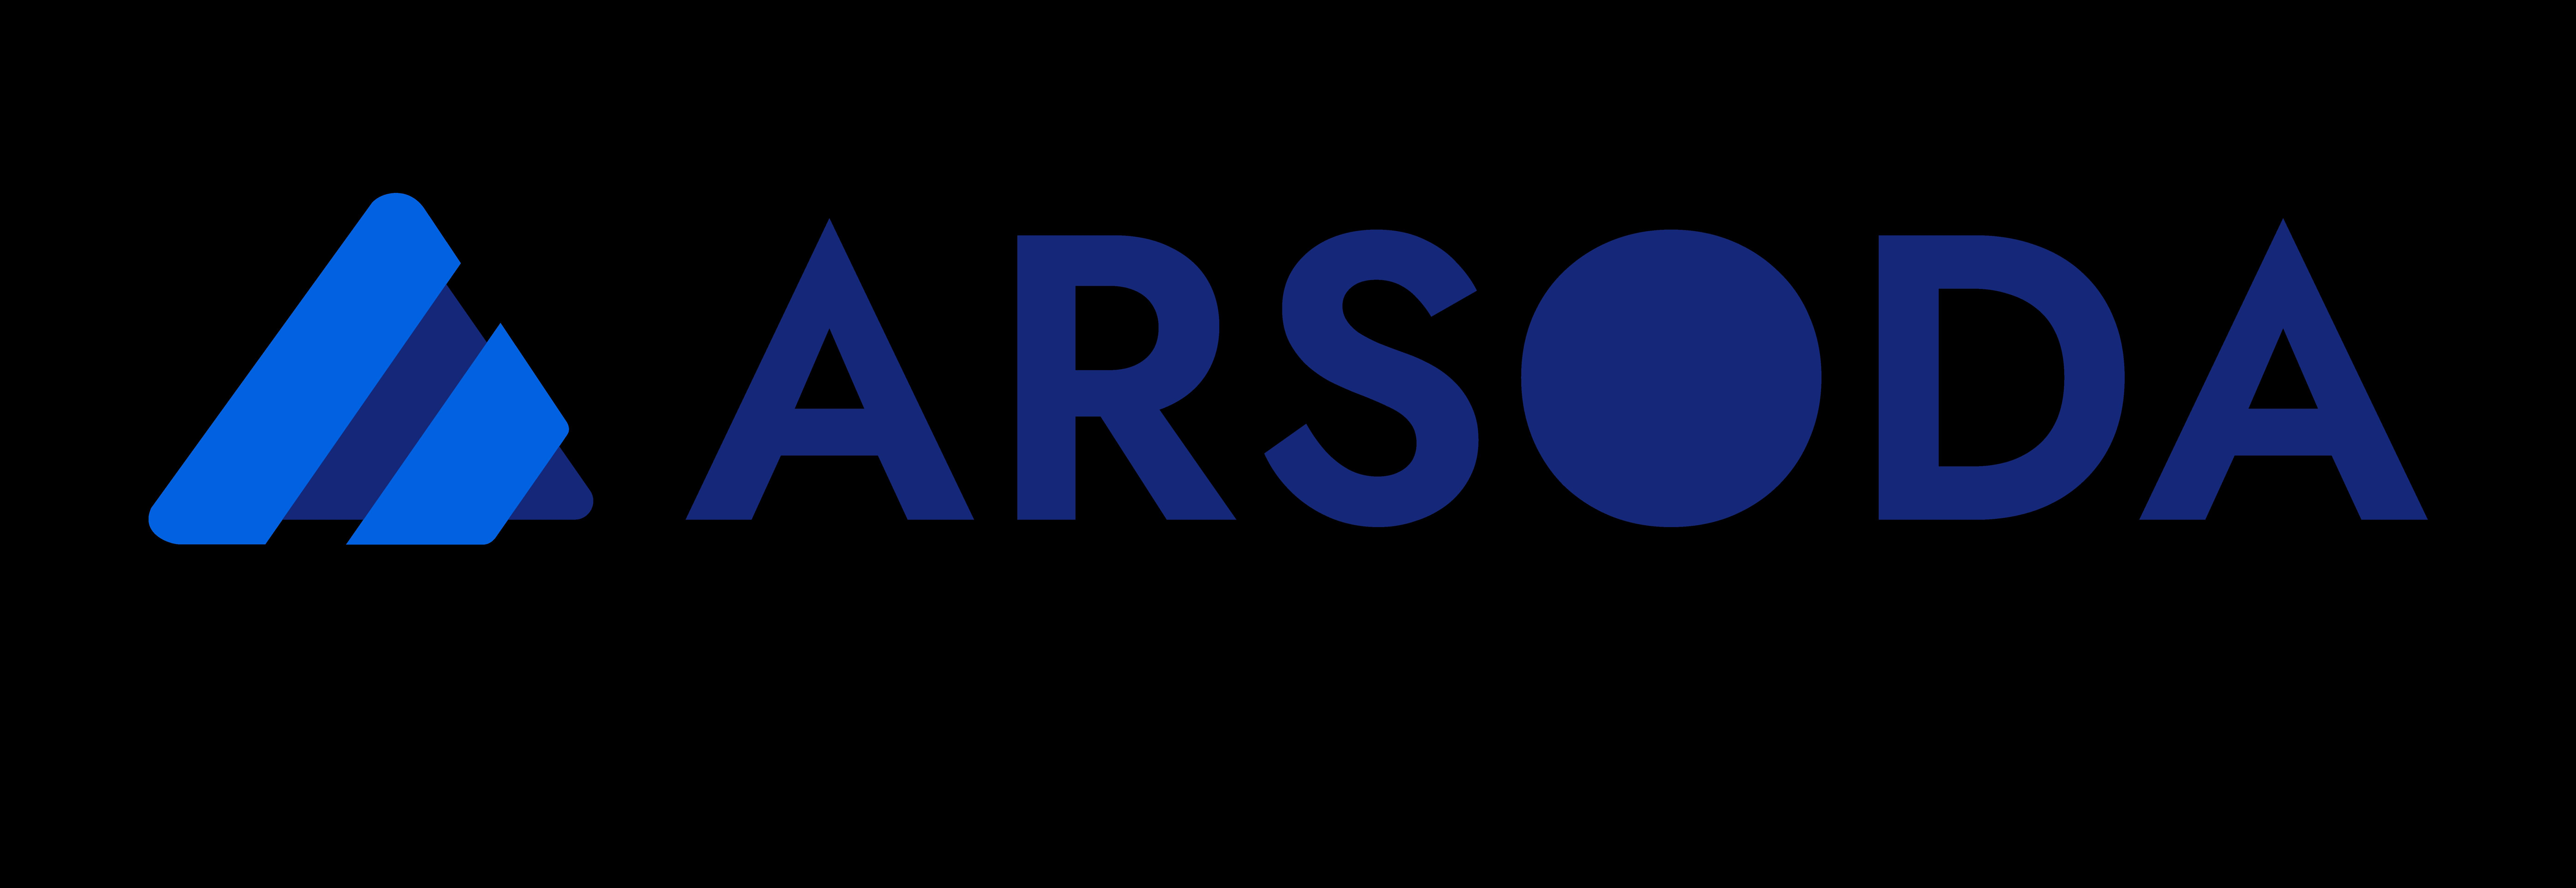 cargo user